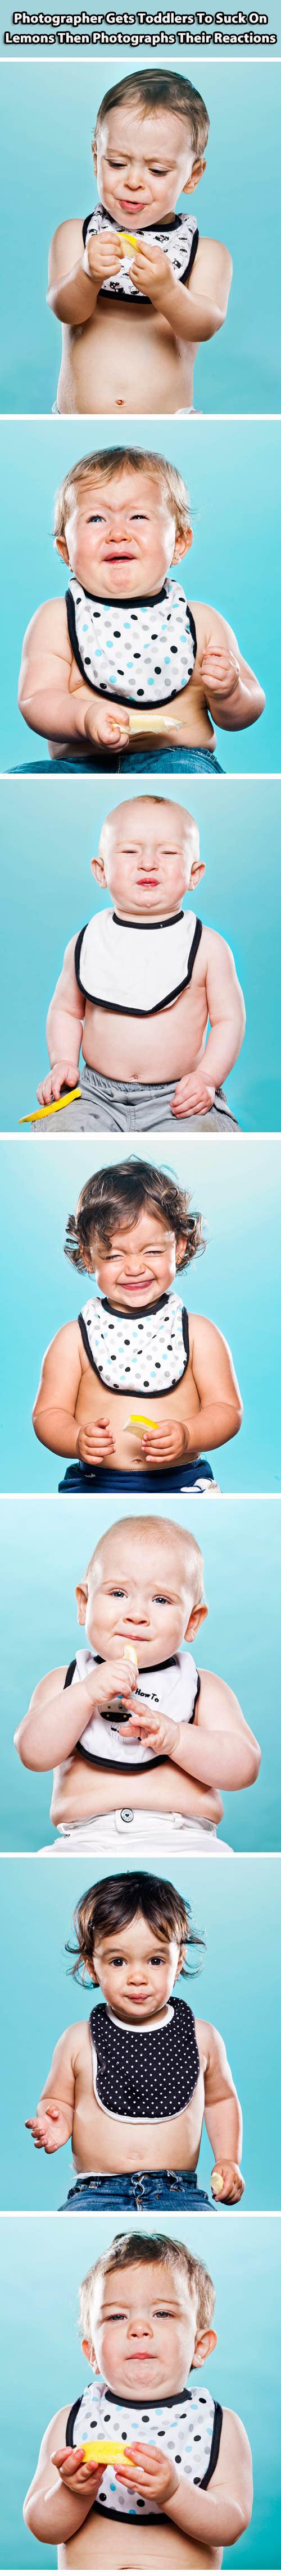 funny-babies-bite-lemon-citric